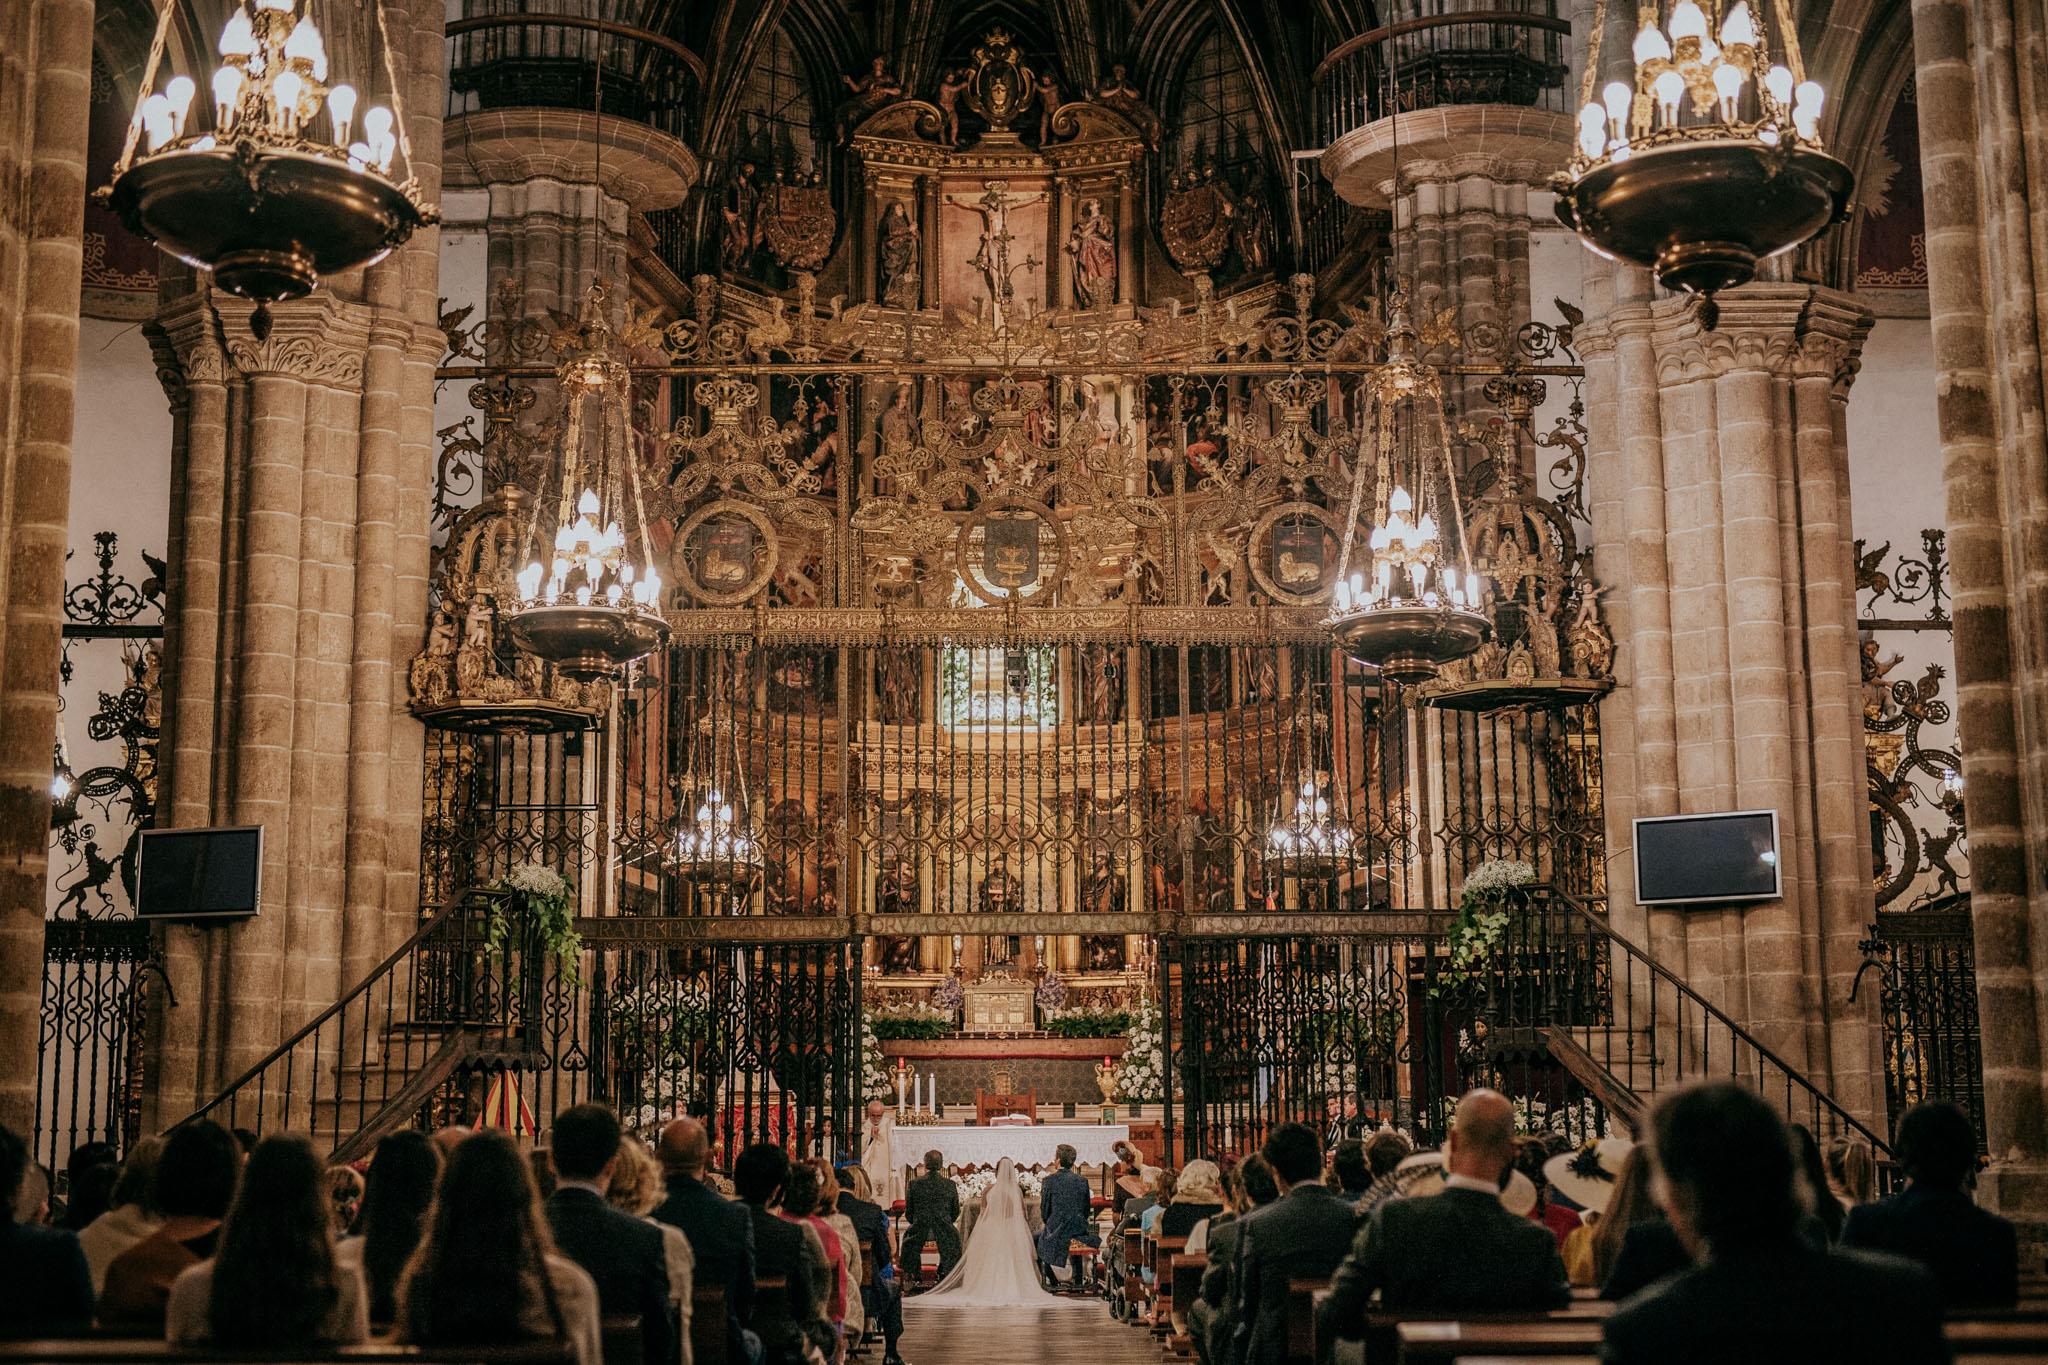 fotografia-boda-wedding-photographer-spain-concorazon-125